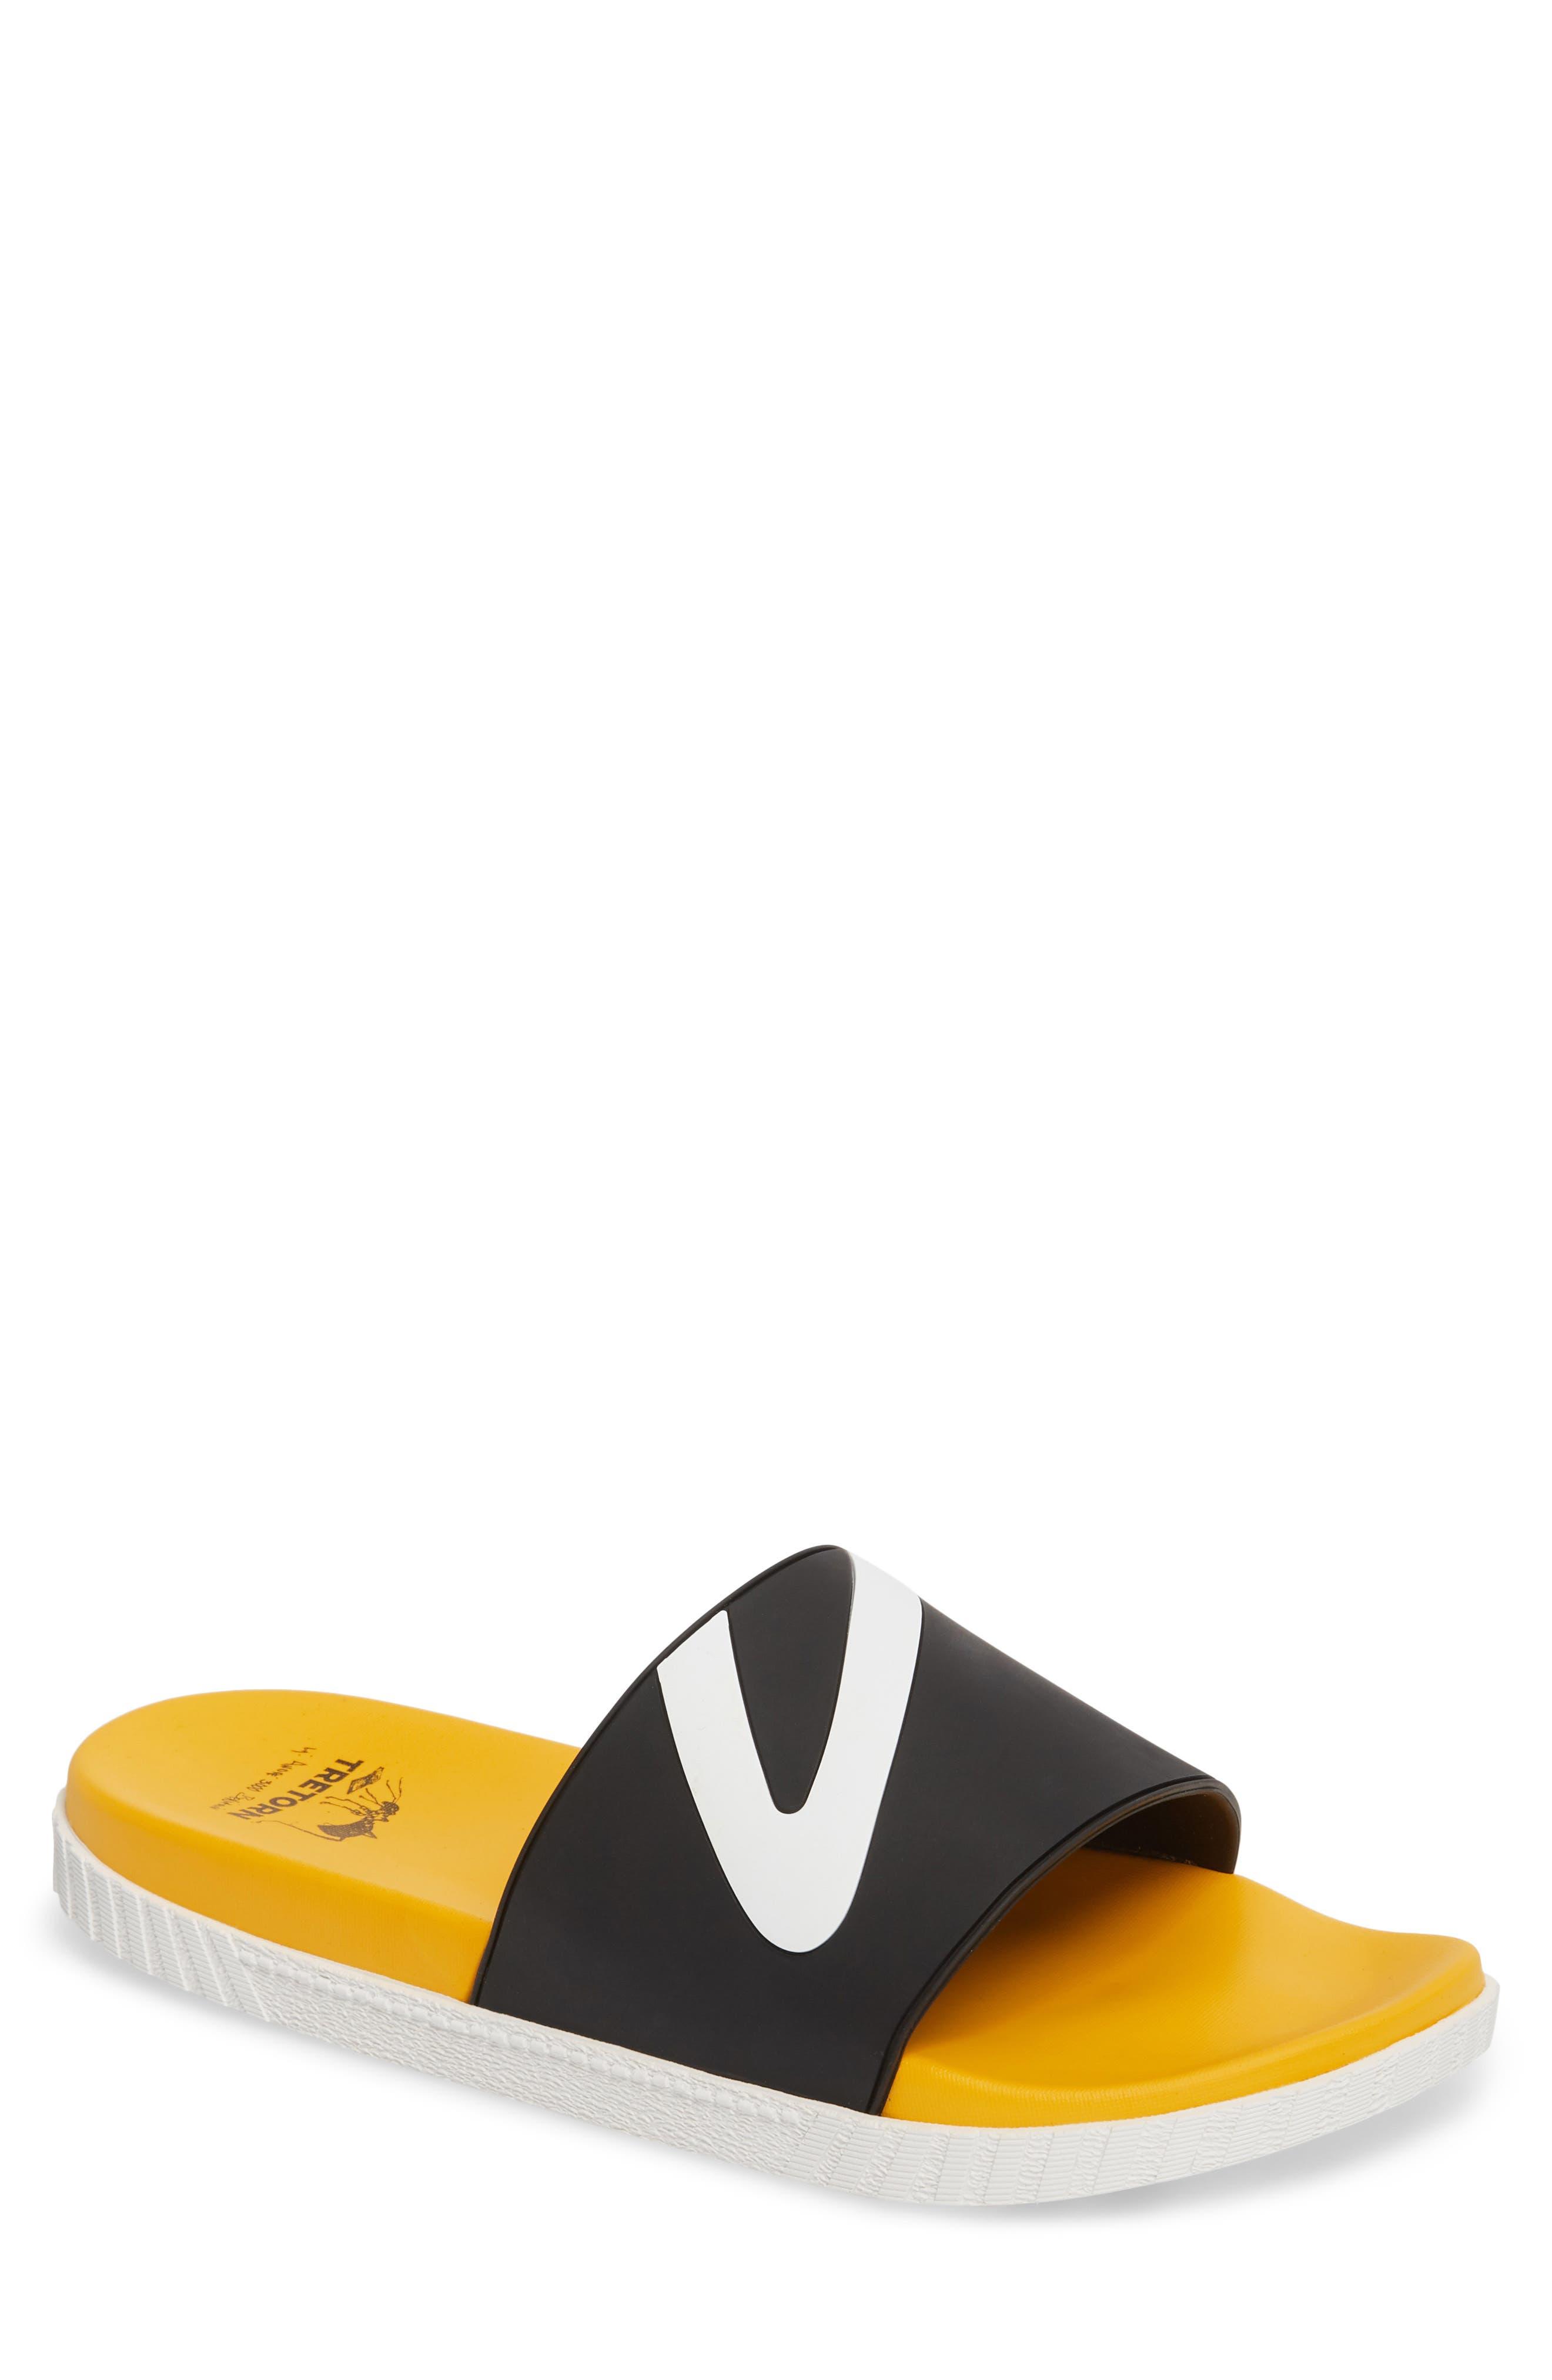 Andre 3000 Slide Sandal,                         Main,                         color, BLACK